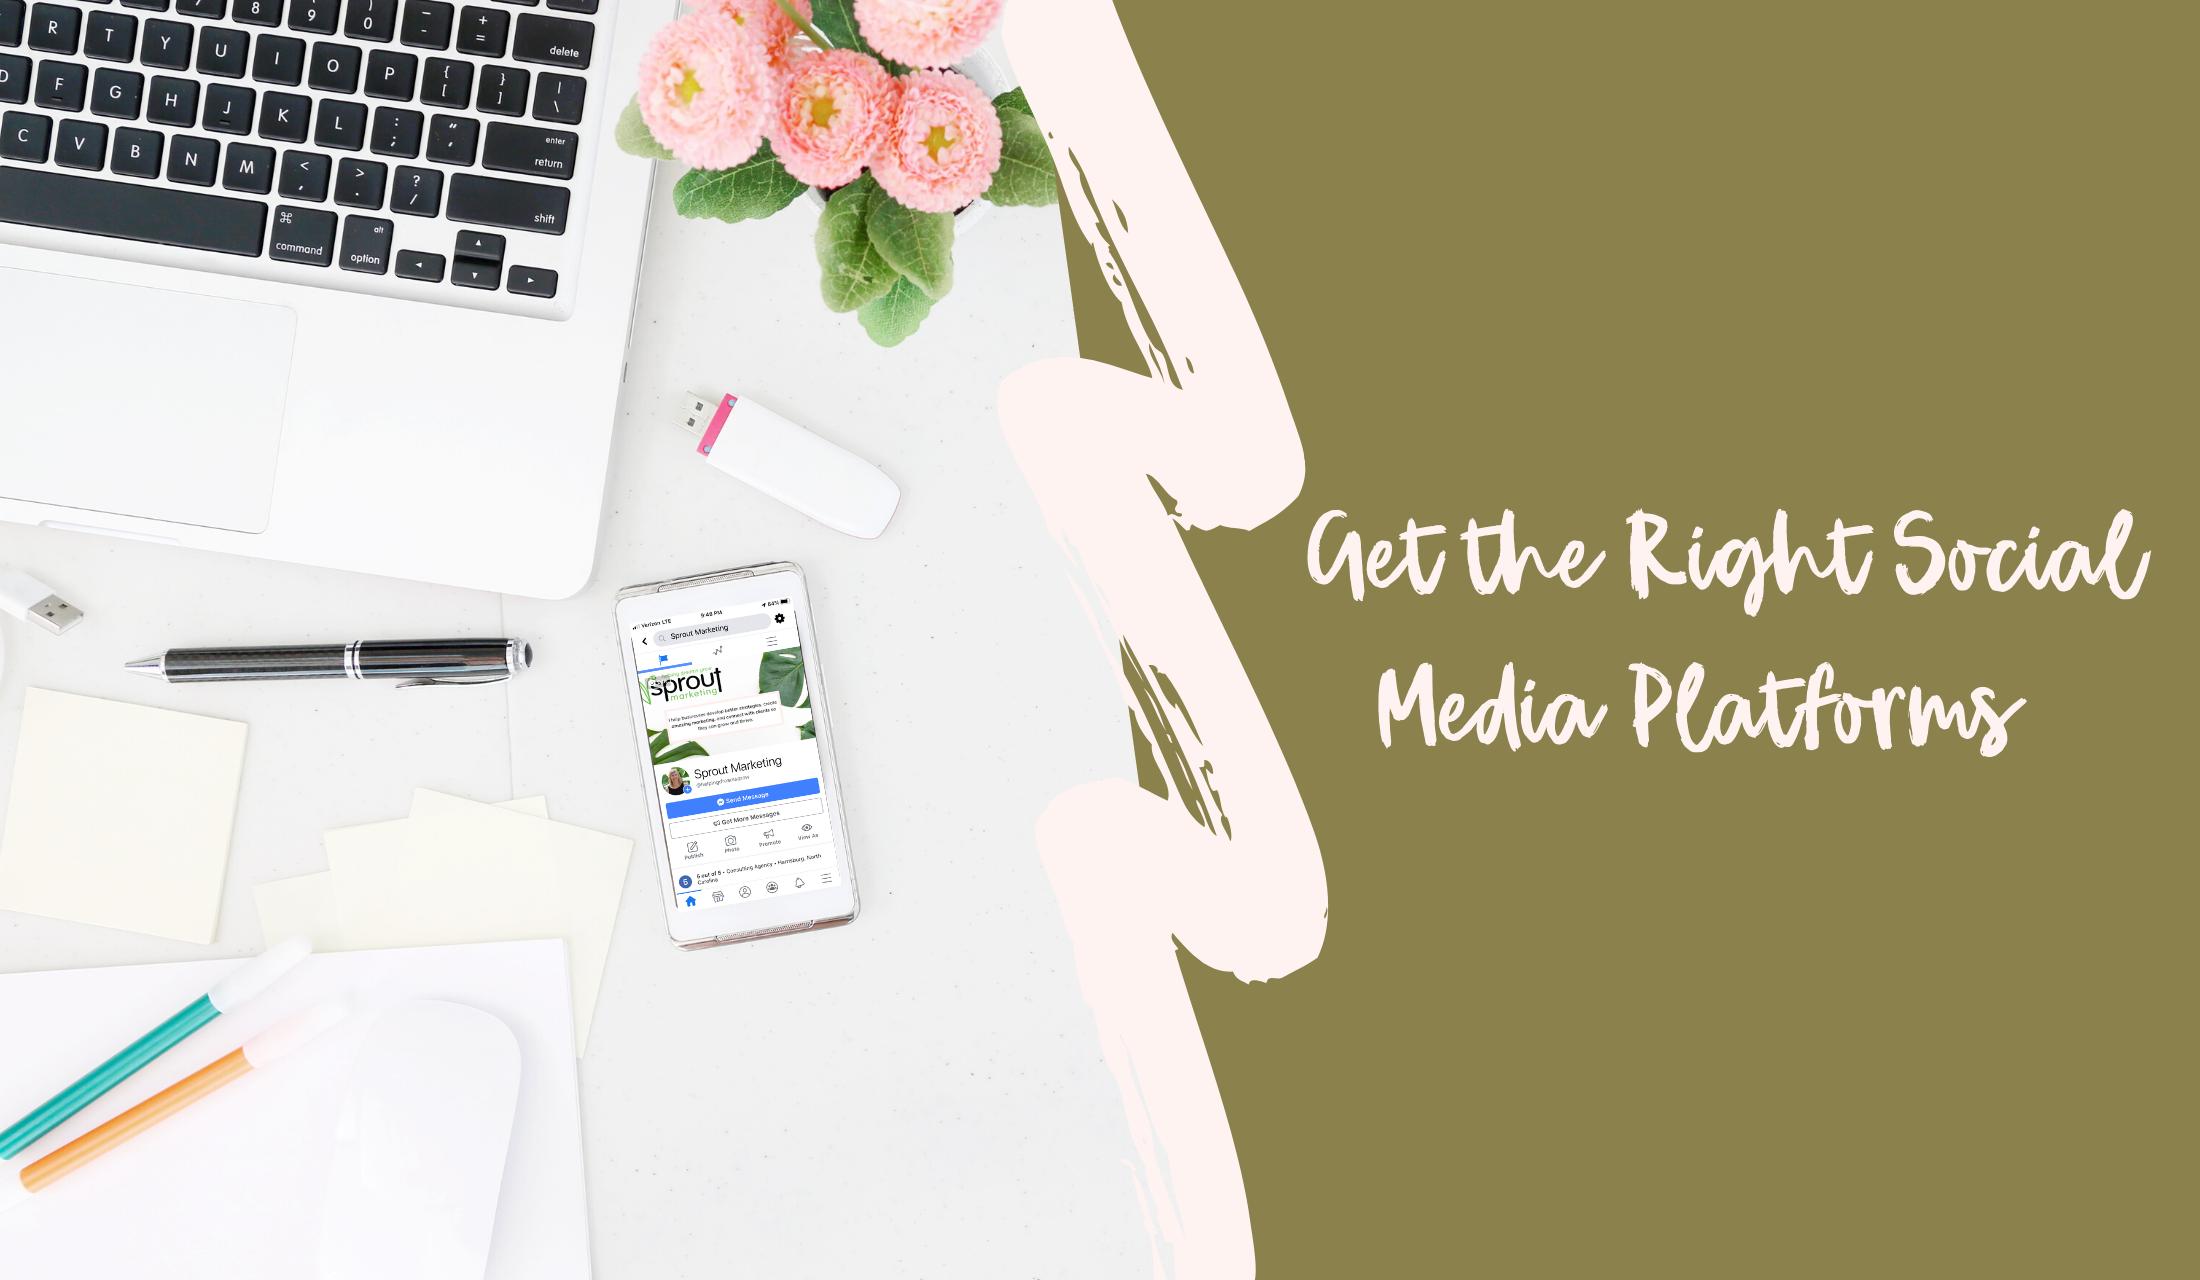 social media platforms for small businesses